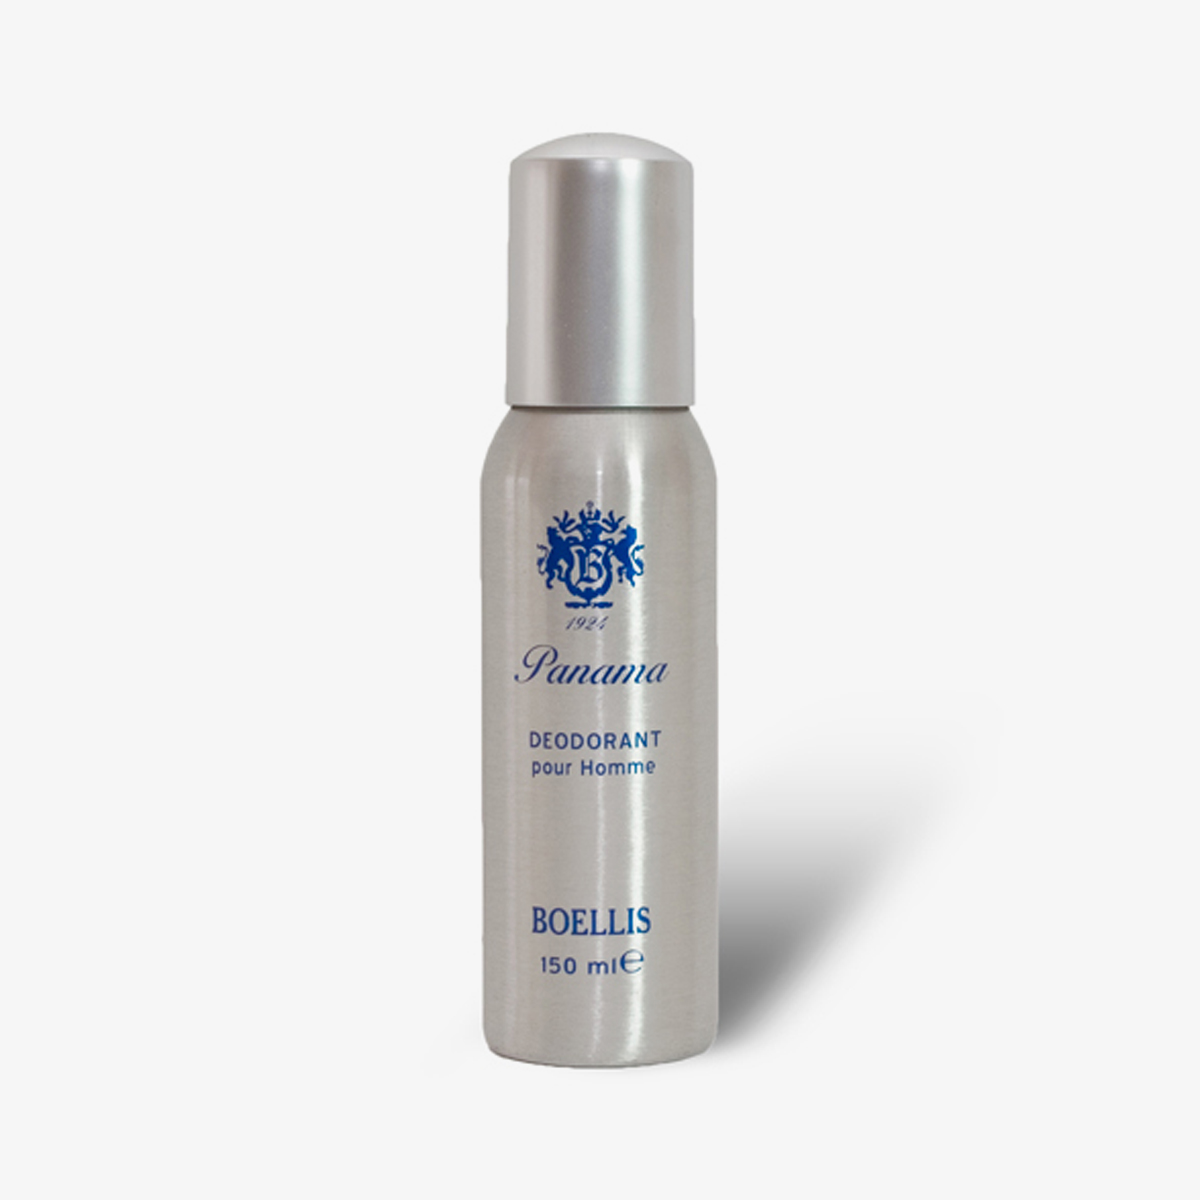 PANAMA Boellis – Deodorante Spray 150 Ml